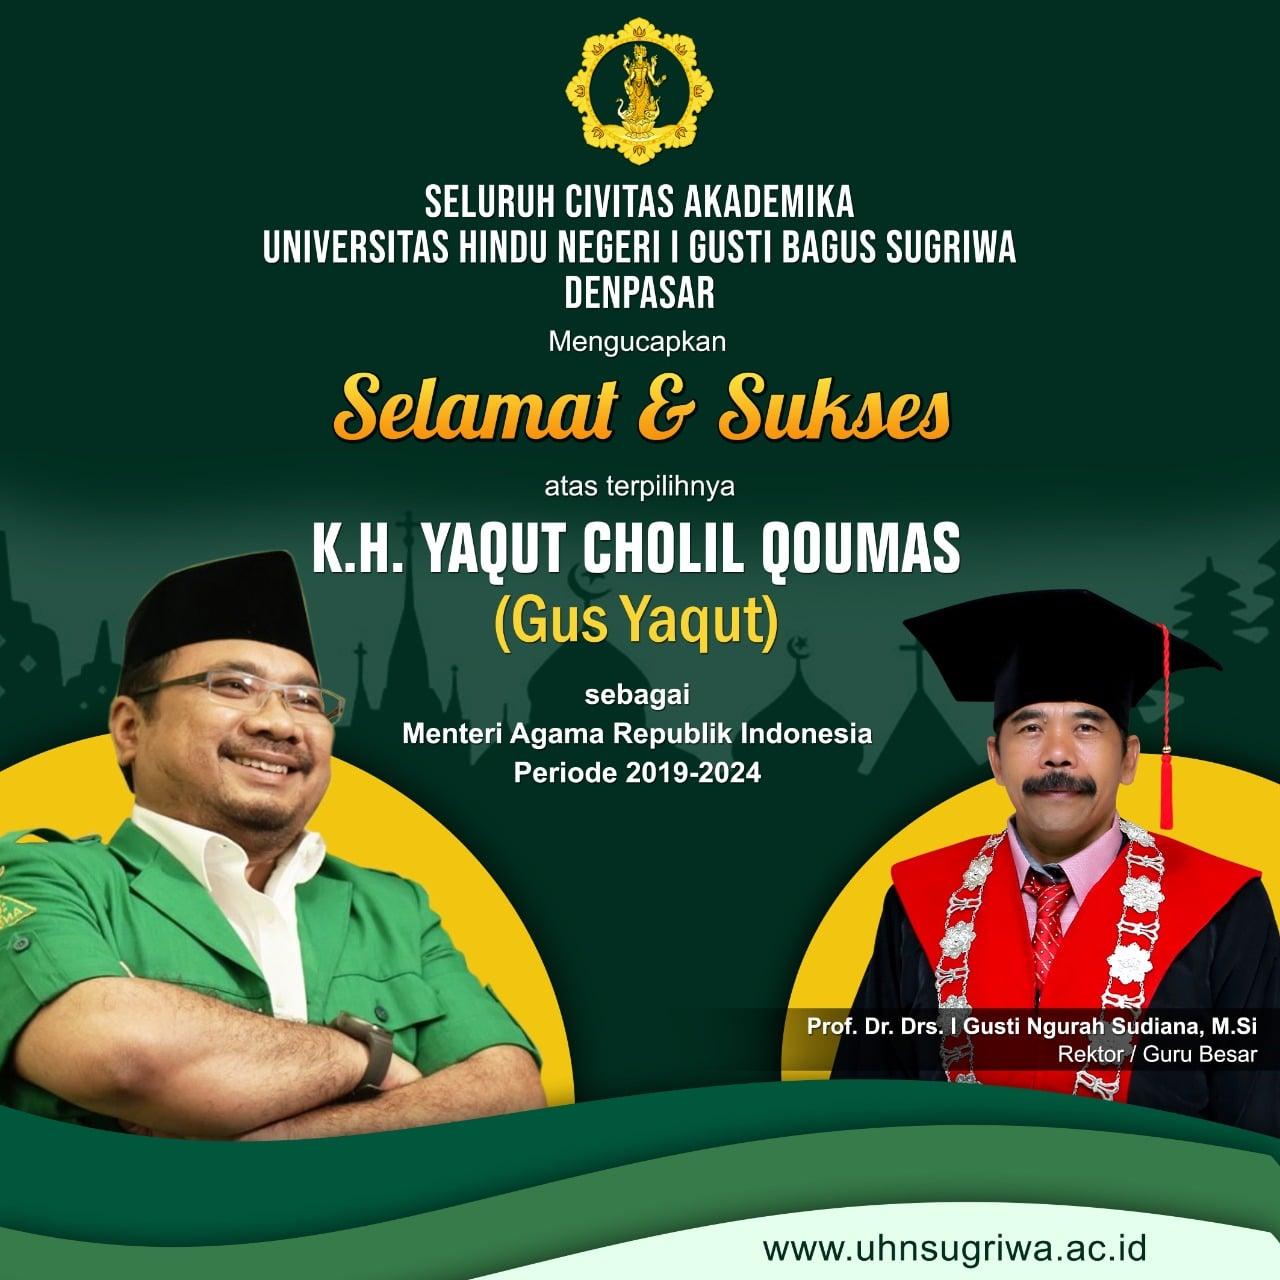 SELAMAT ATAS TERPILIHNYA KH. YAQUT CHOLIL QOUMAS SEBAGAI MENTERI AGAMA REPUBLIK INDONESIA PERIODE 2019-2024